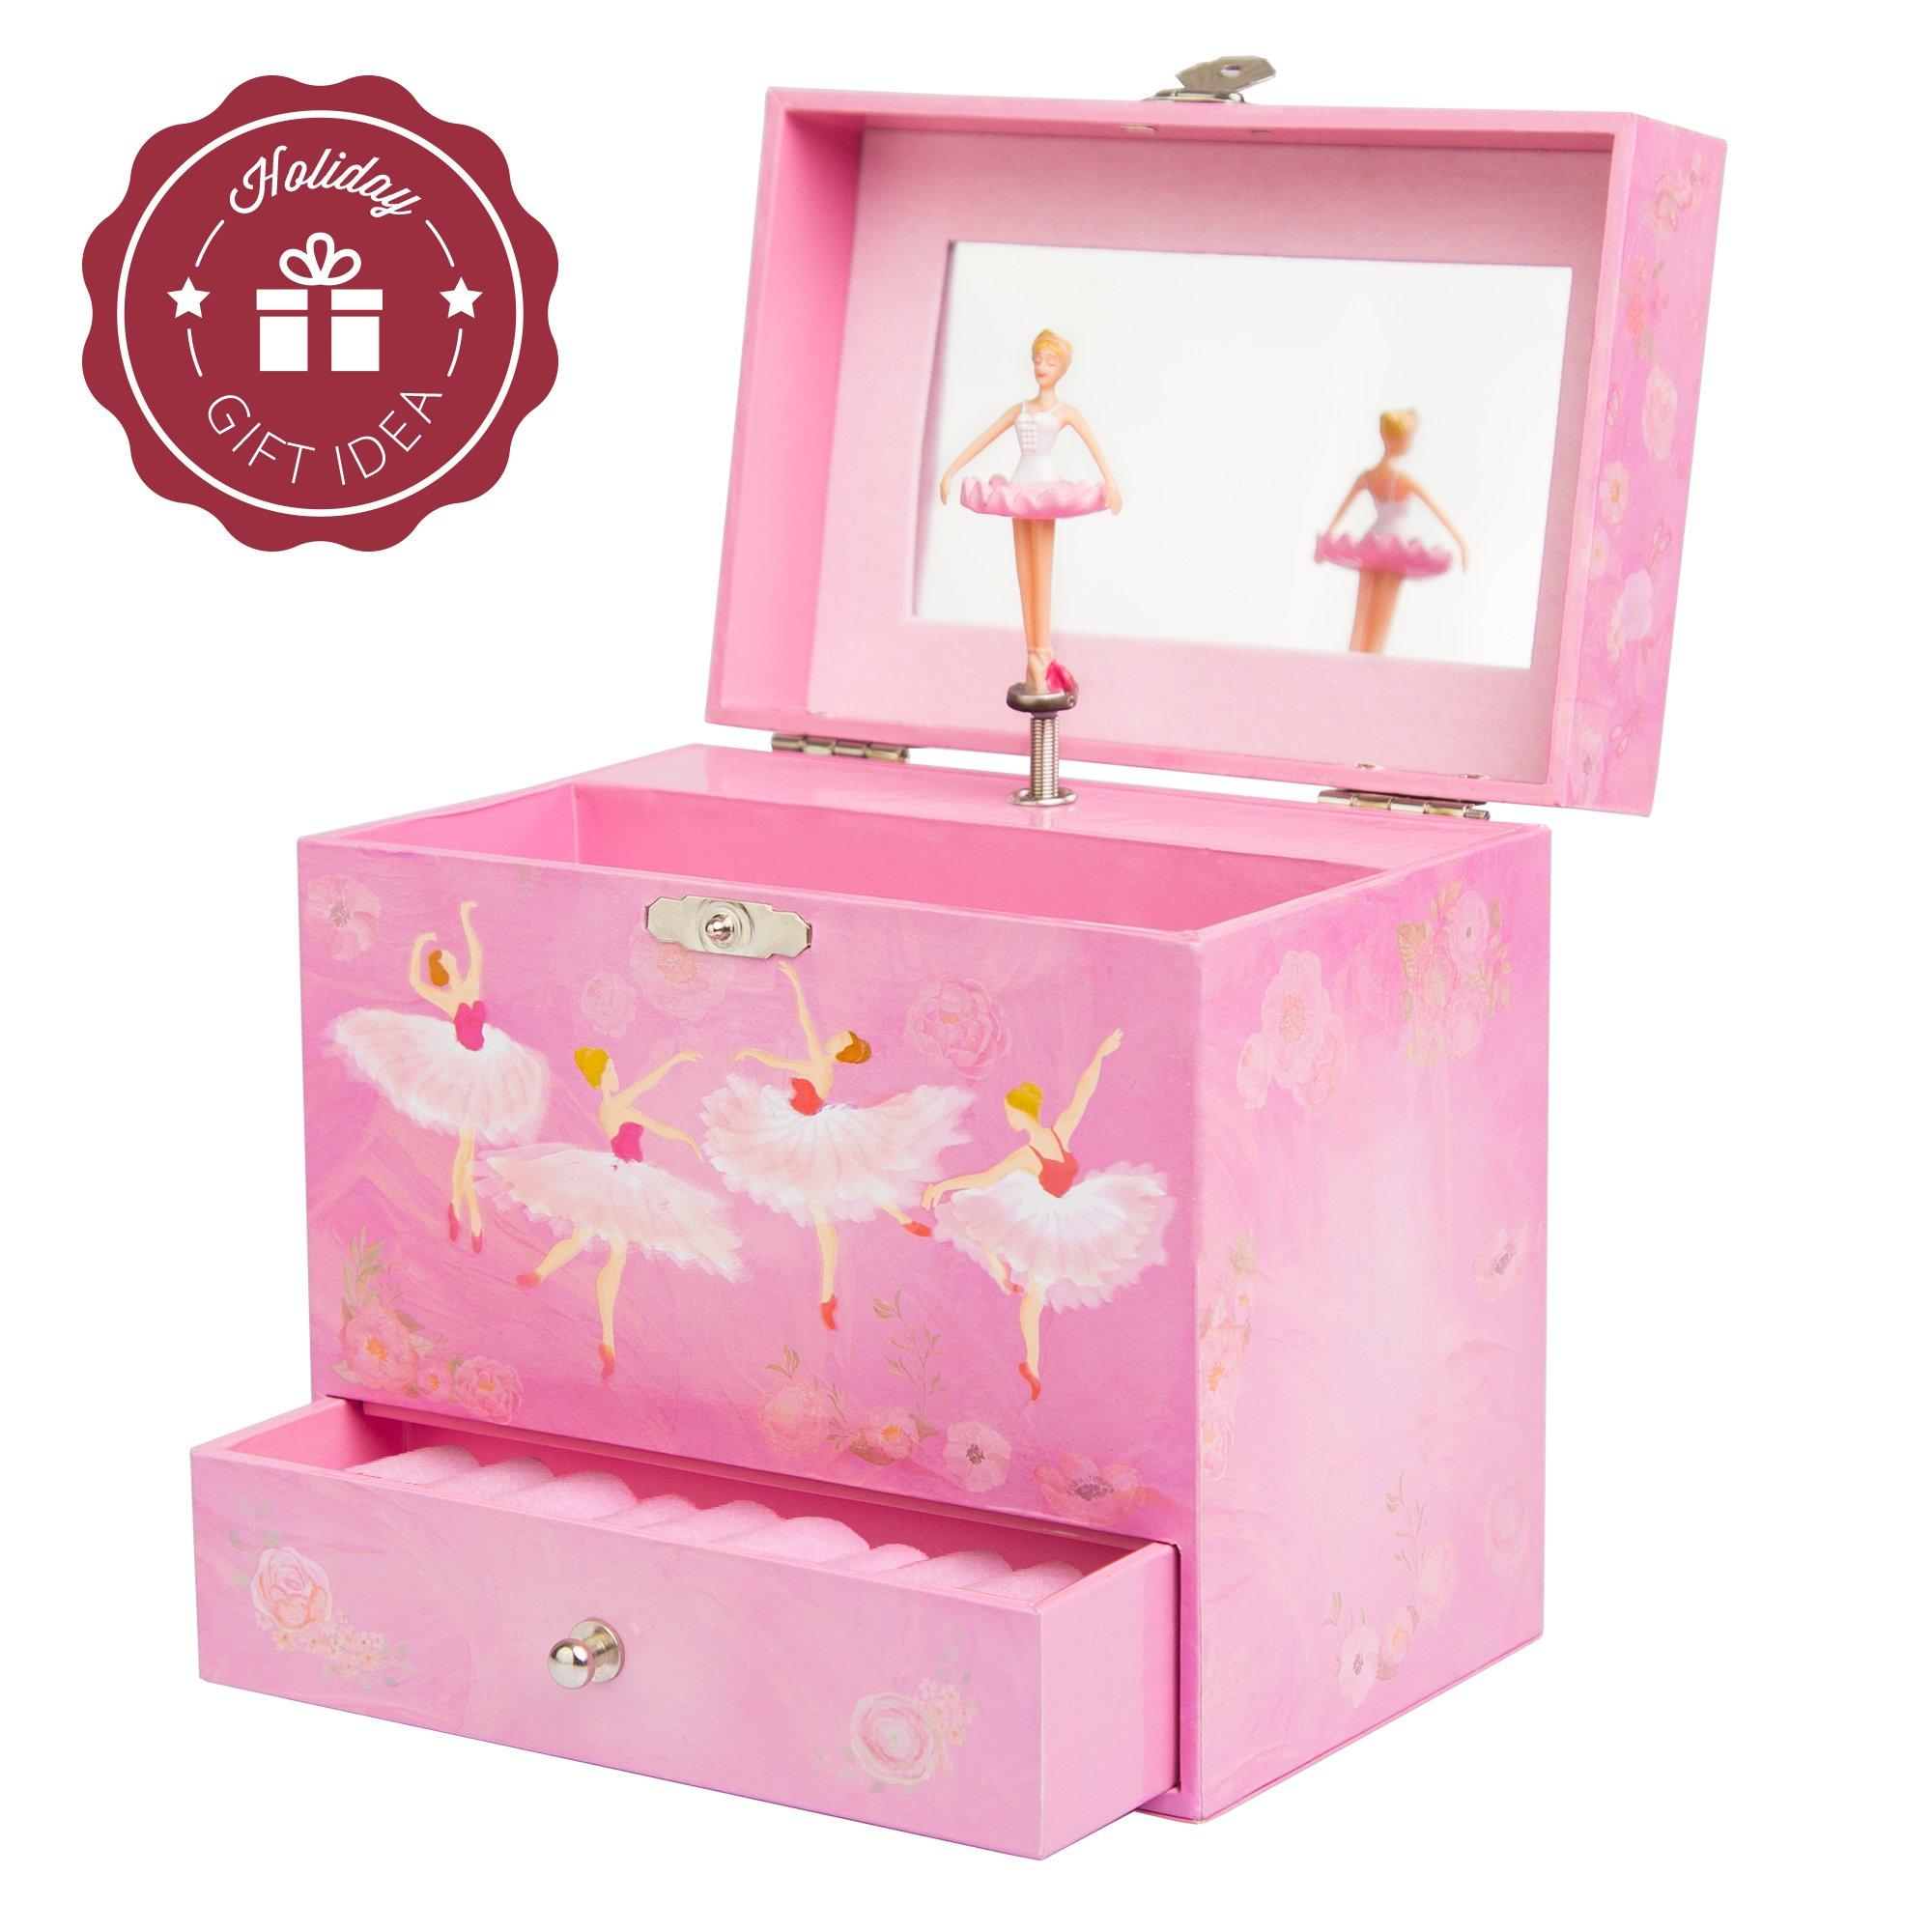 Pink Girls Musical Jewelry Box Ballet with Dance Ballerina Mirror Birthday Gift